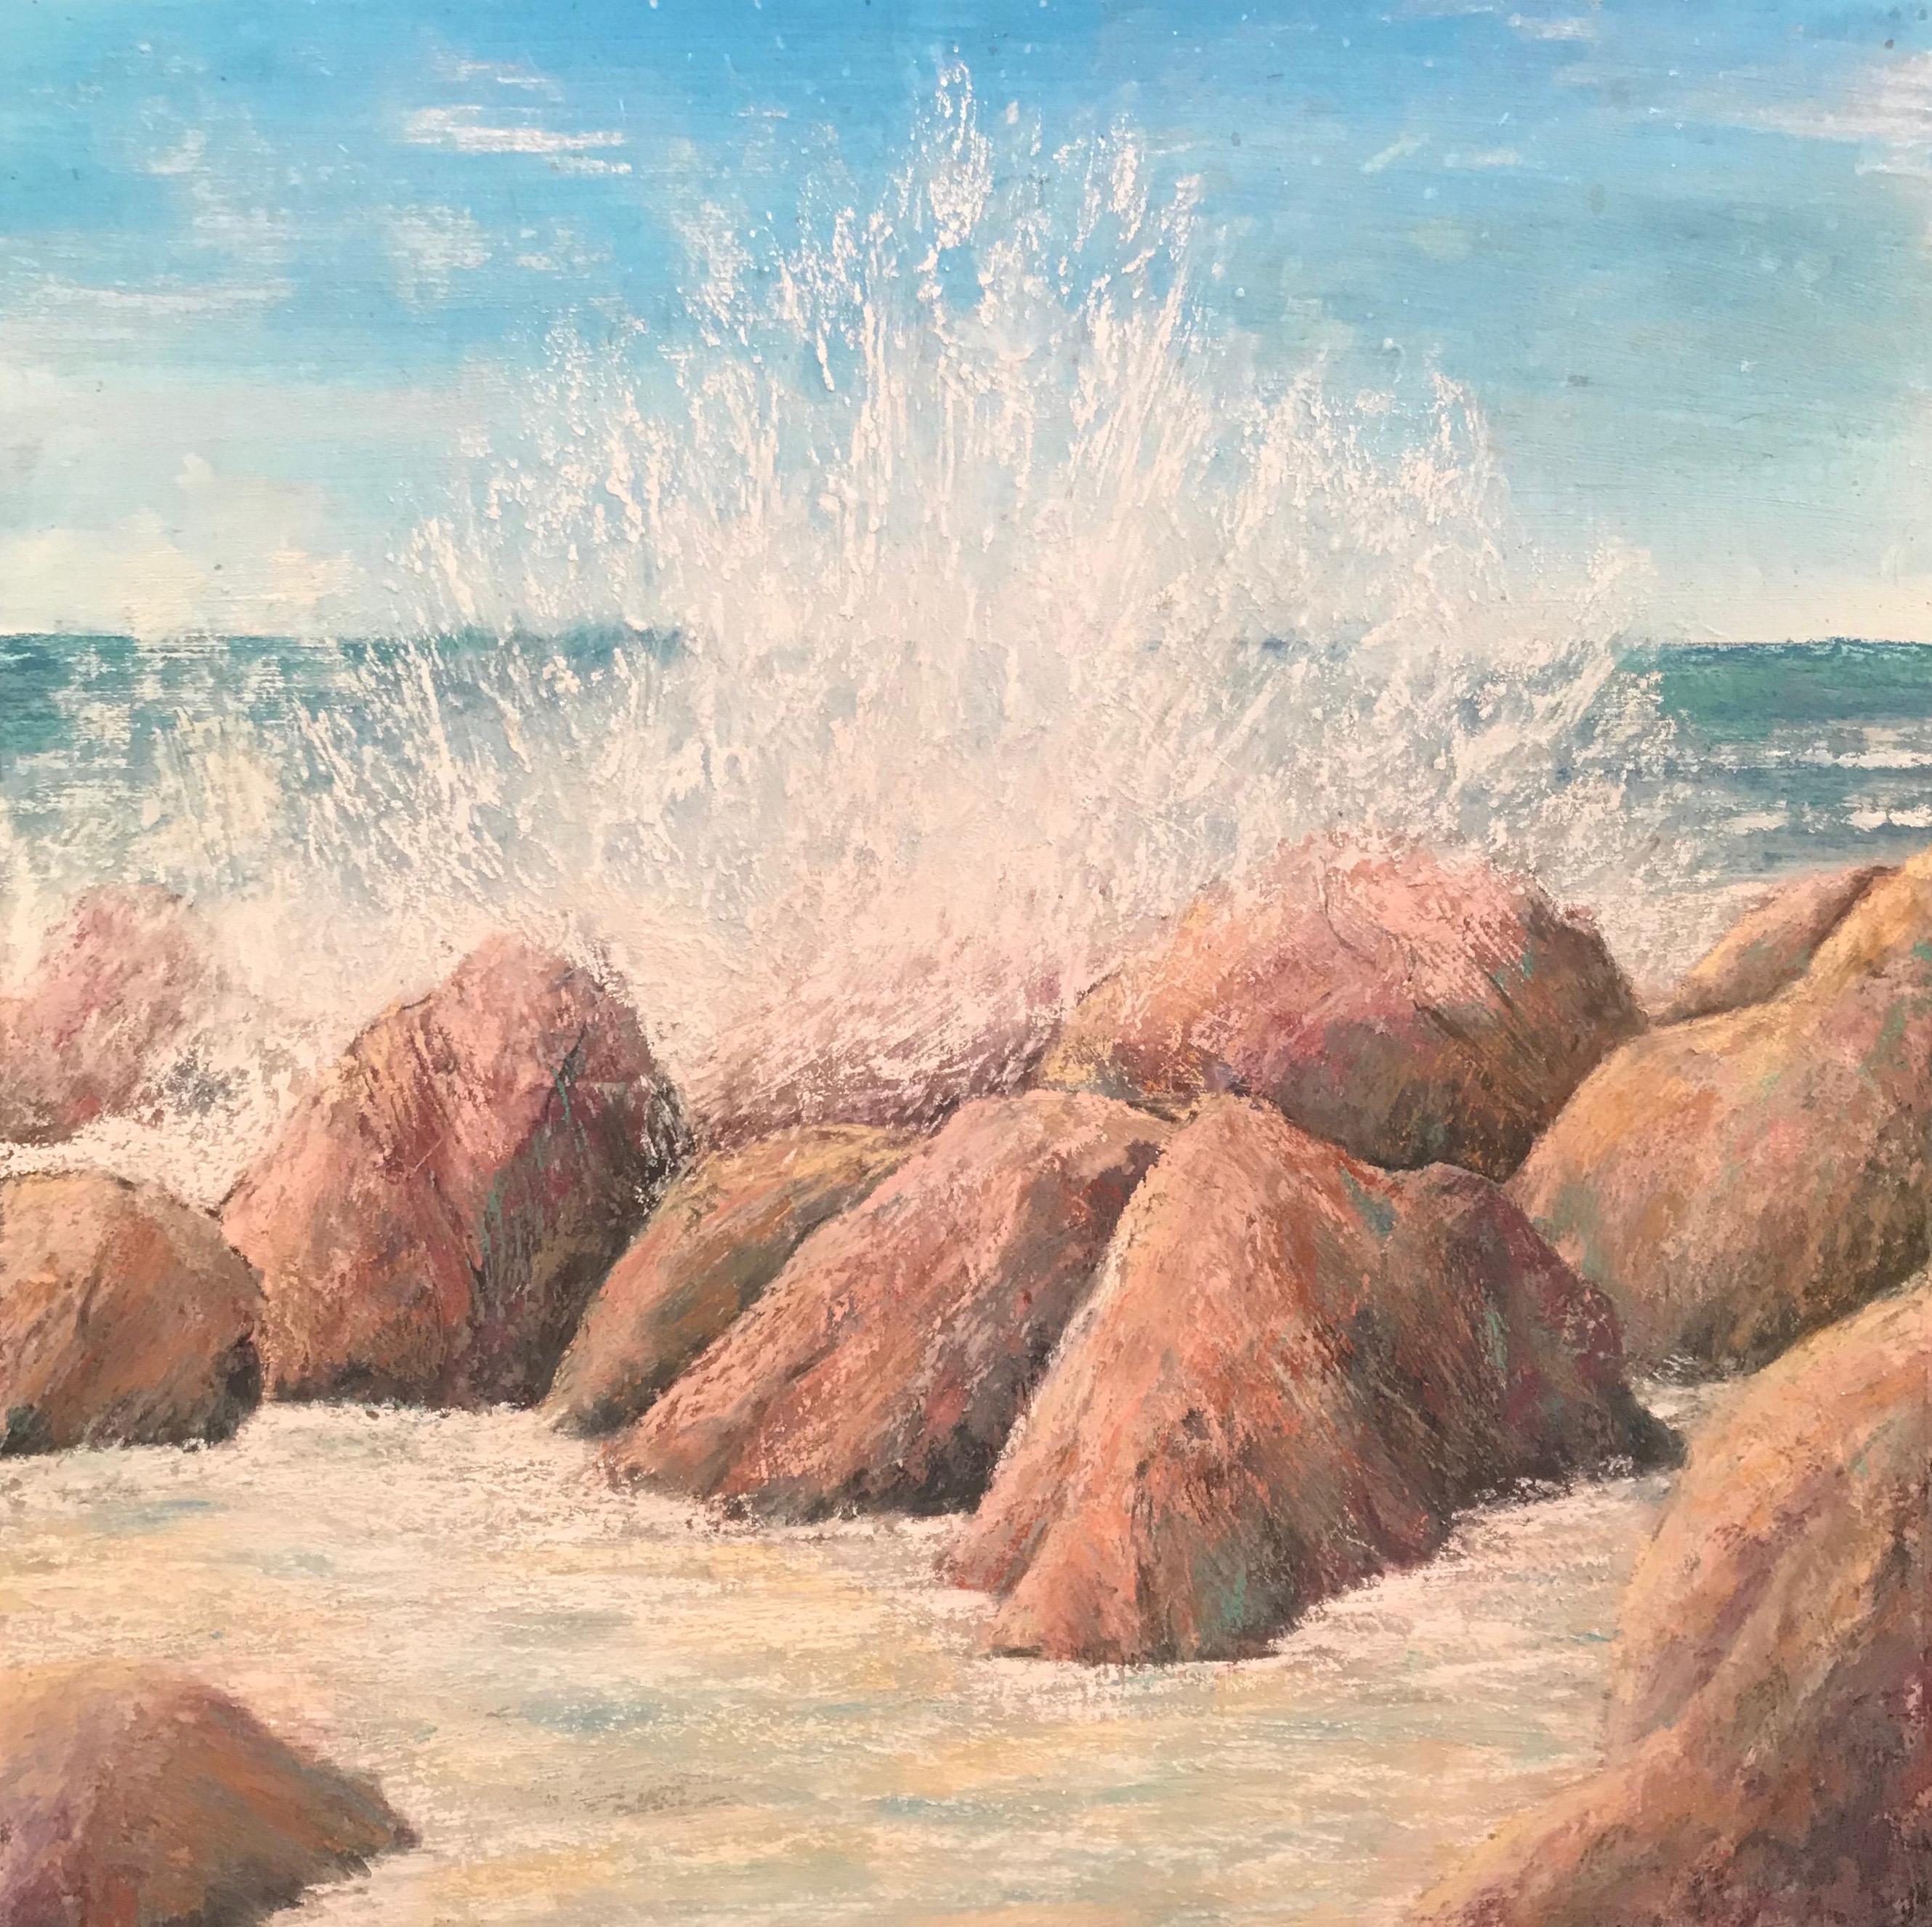 Waves crash upon the stolid rock